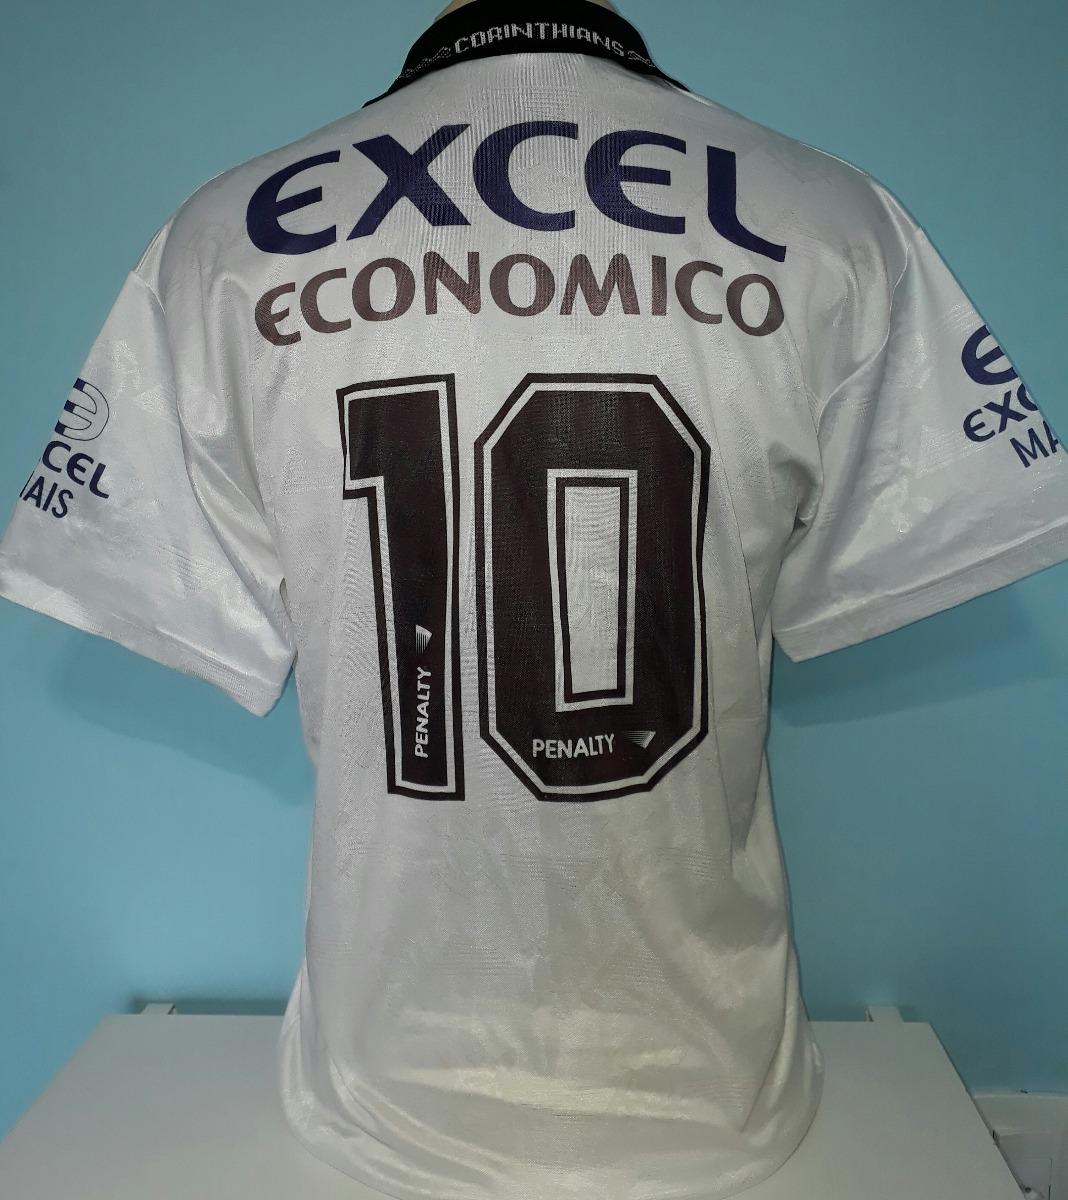 camisa corinthians penalty excel campeão 1997 paulista - 40. Carregando  zoom. d7bcdccabc62c